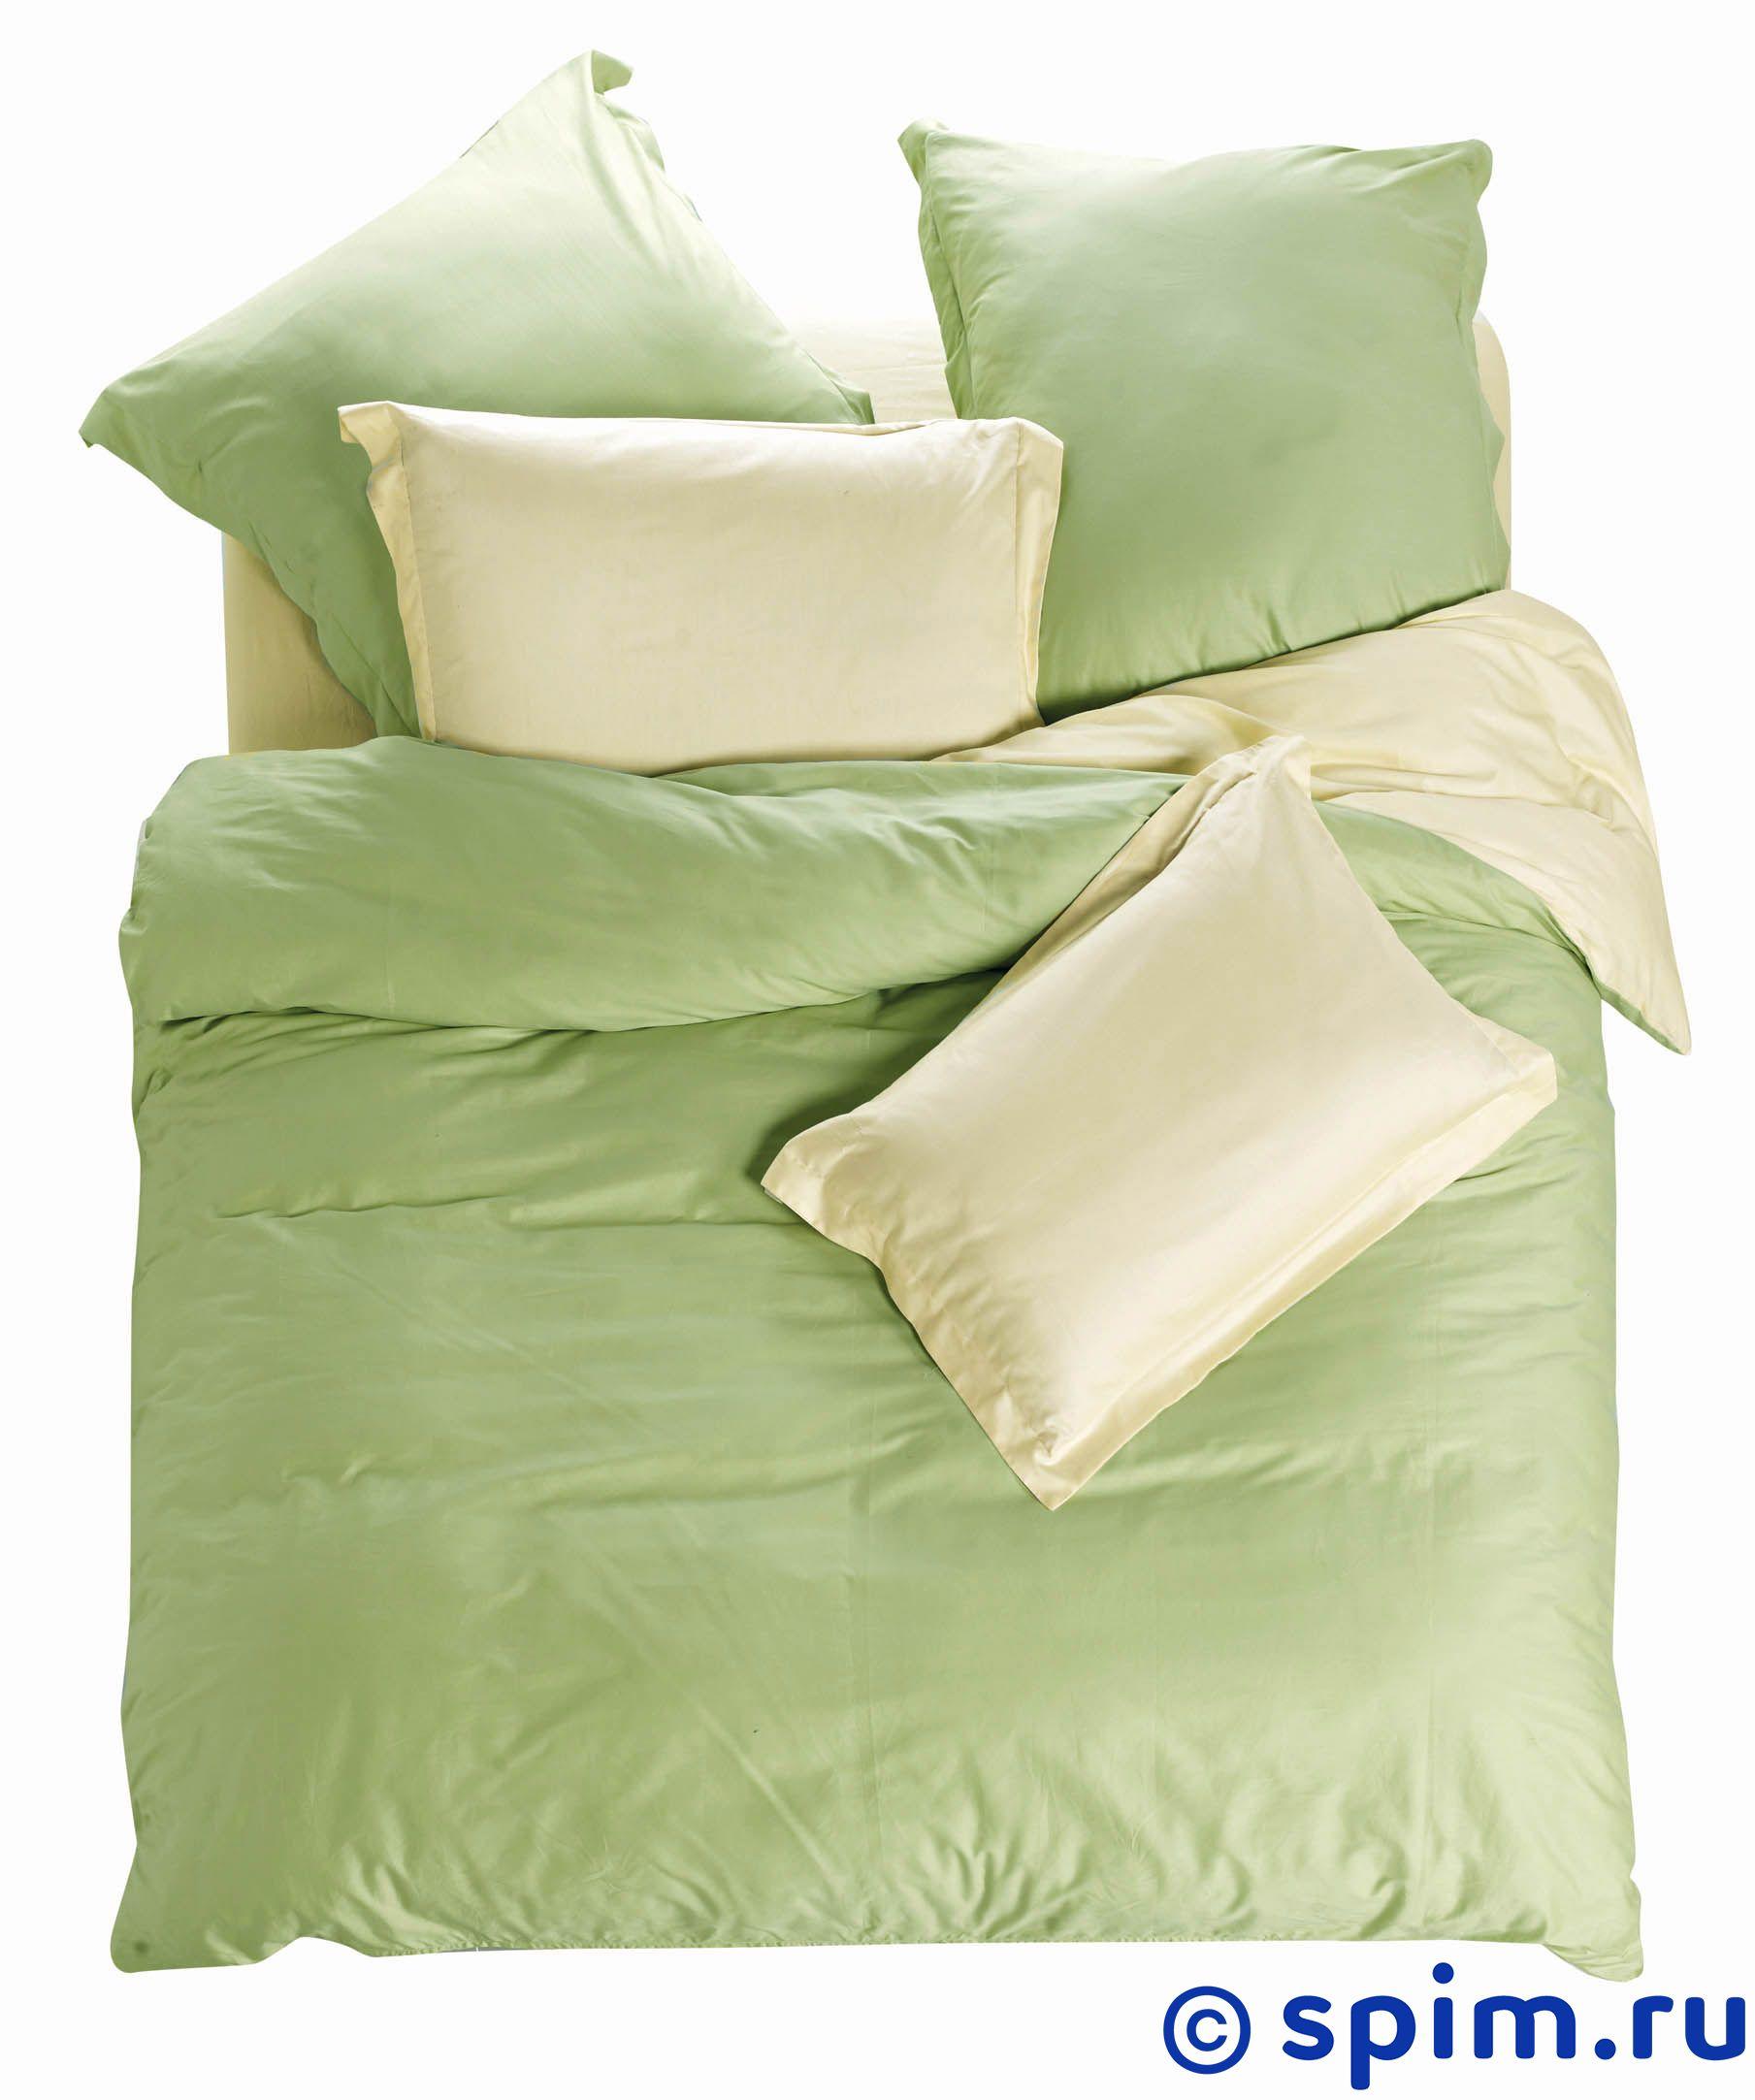 Комплект СайлиД L4 1.5 спальное